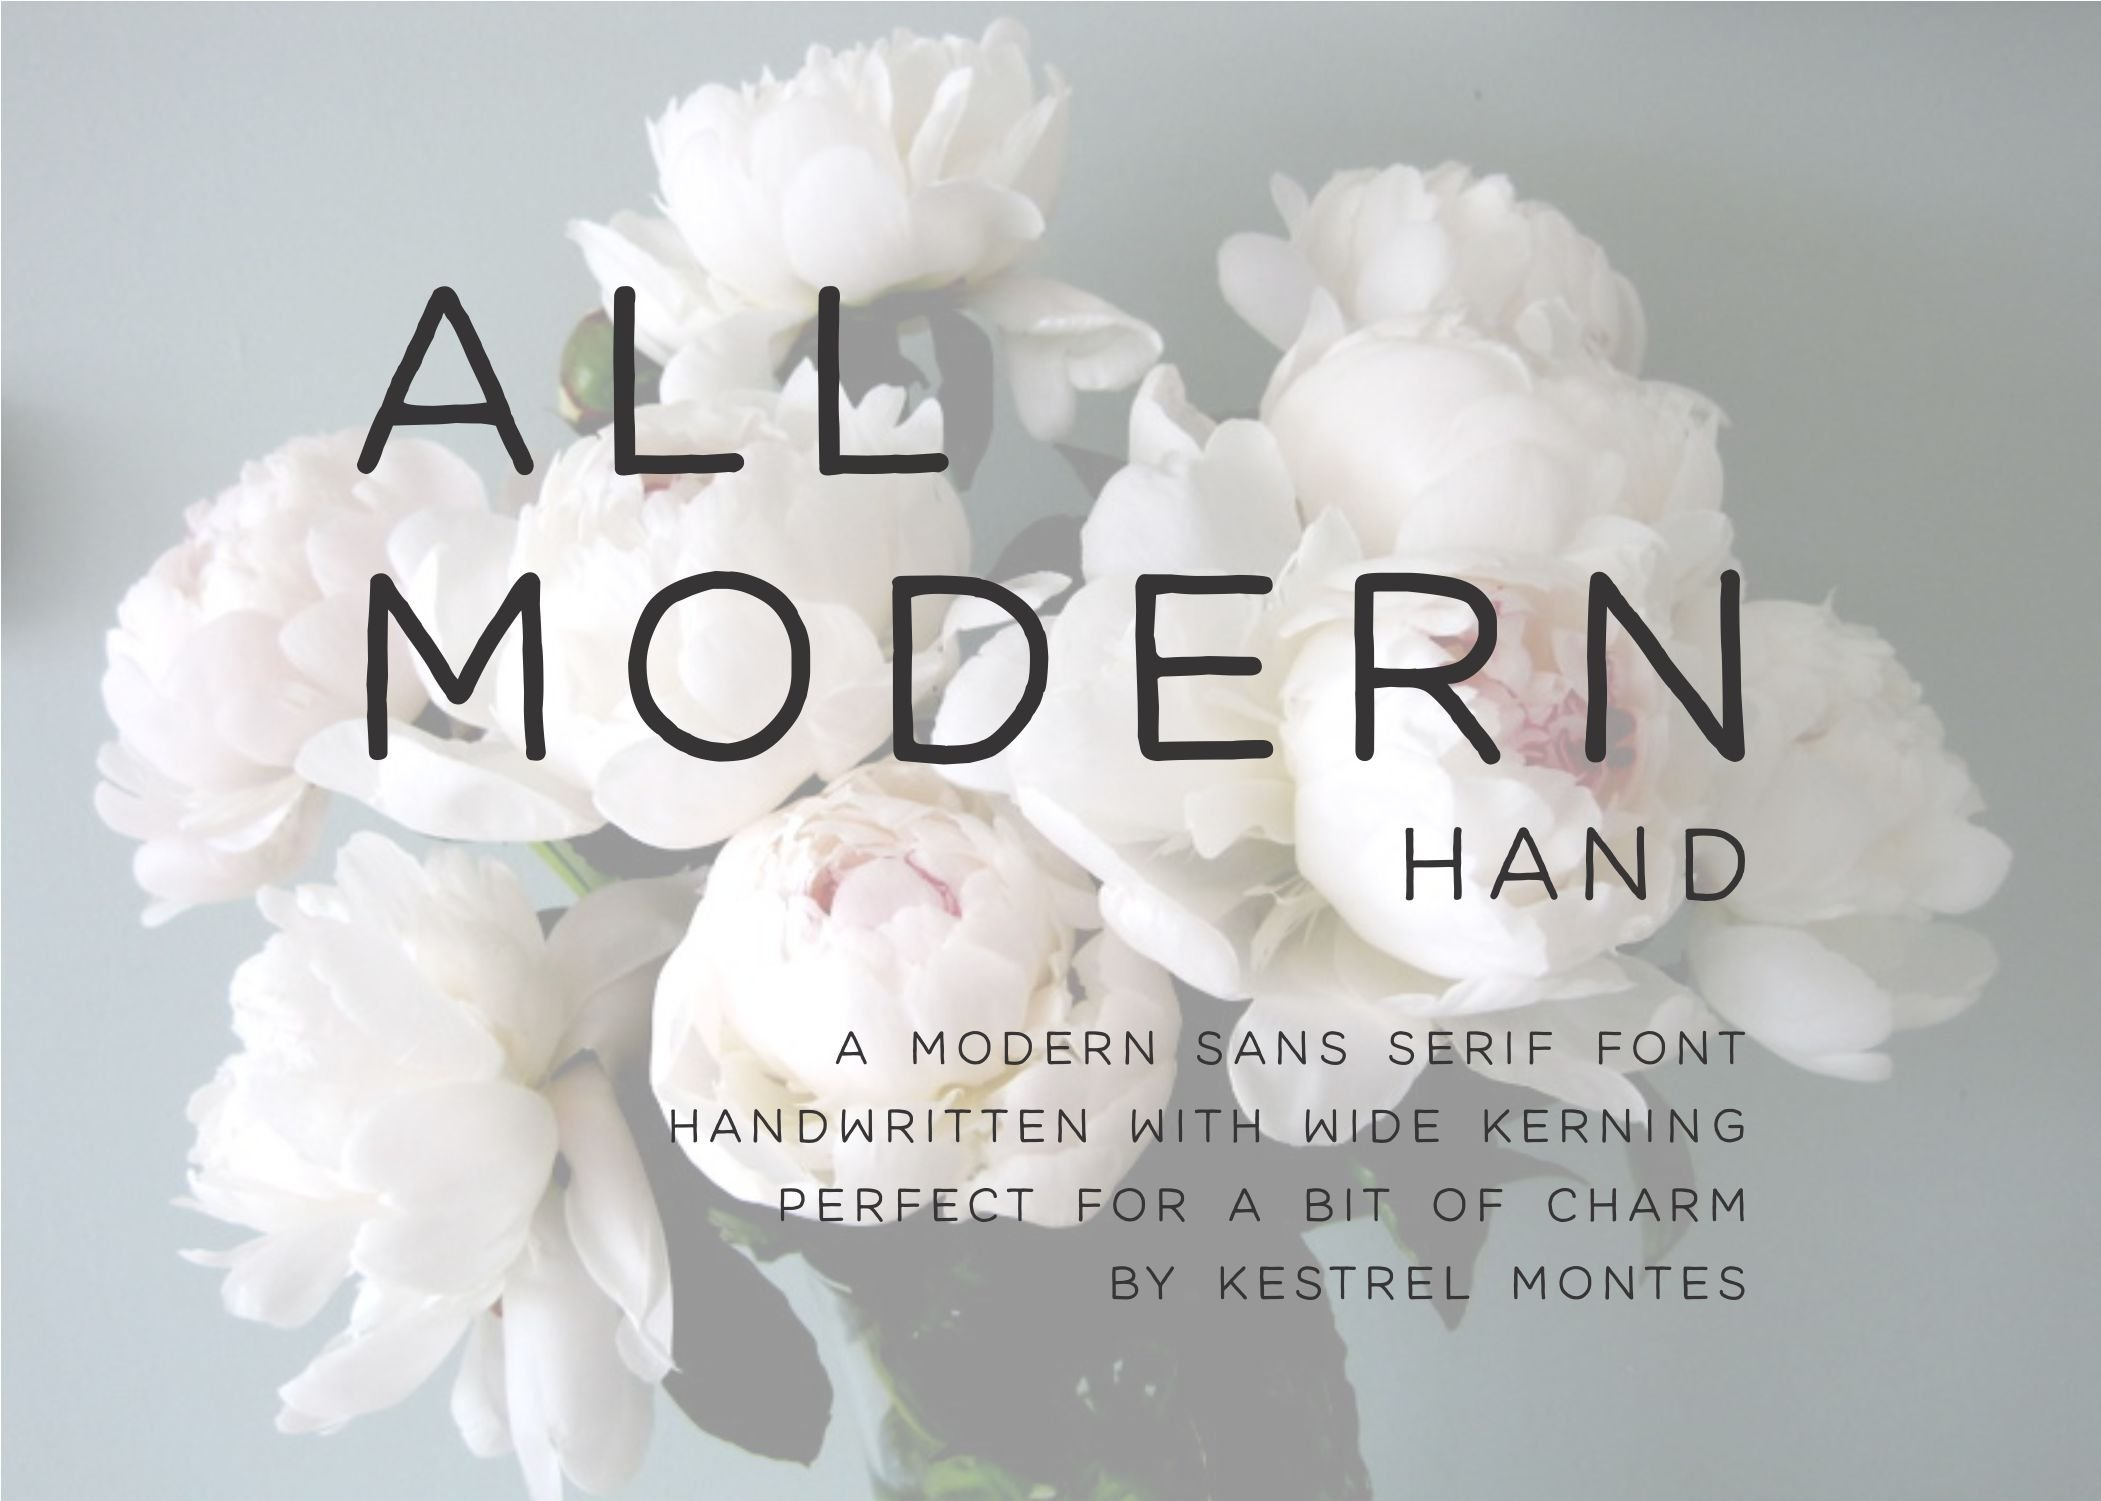 All Modern Hand Sans Serif Fonts Creative Market Planting Roses Diagram Click For Printer Friendly Download